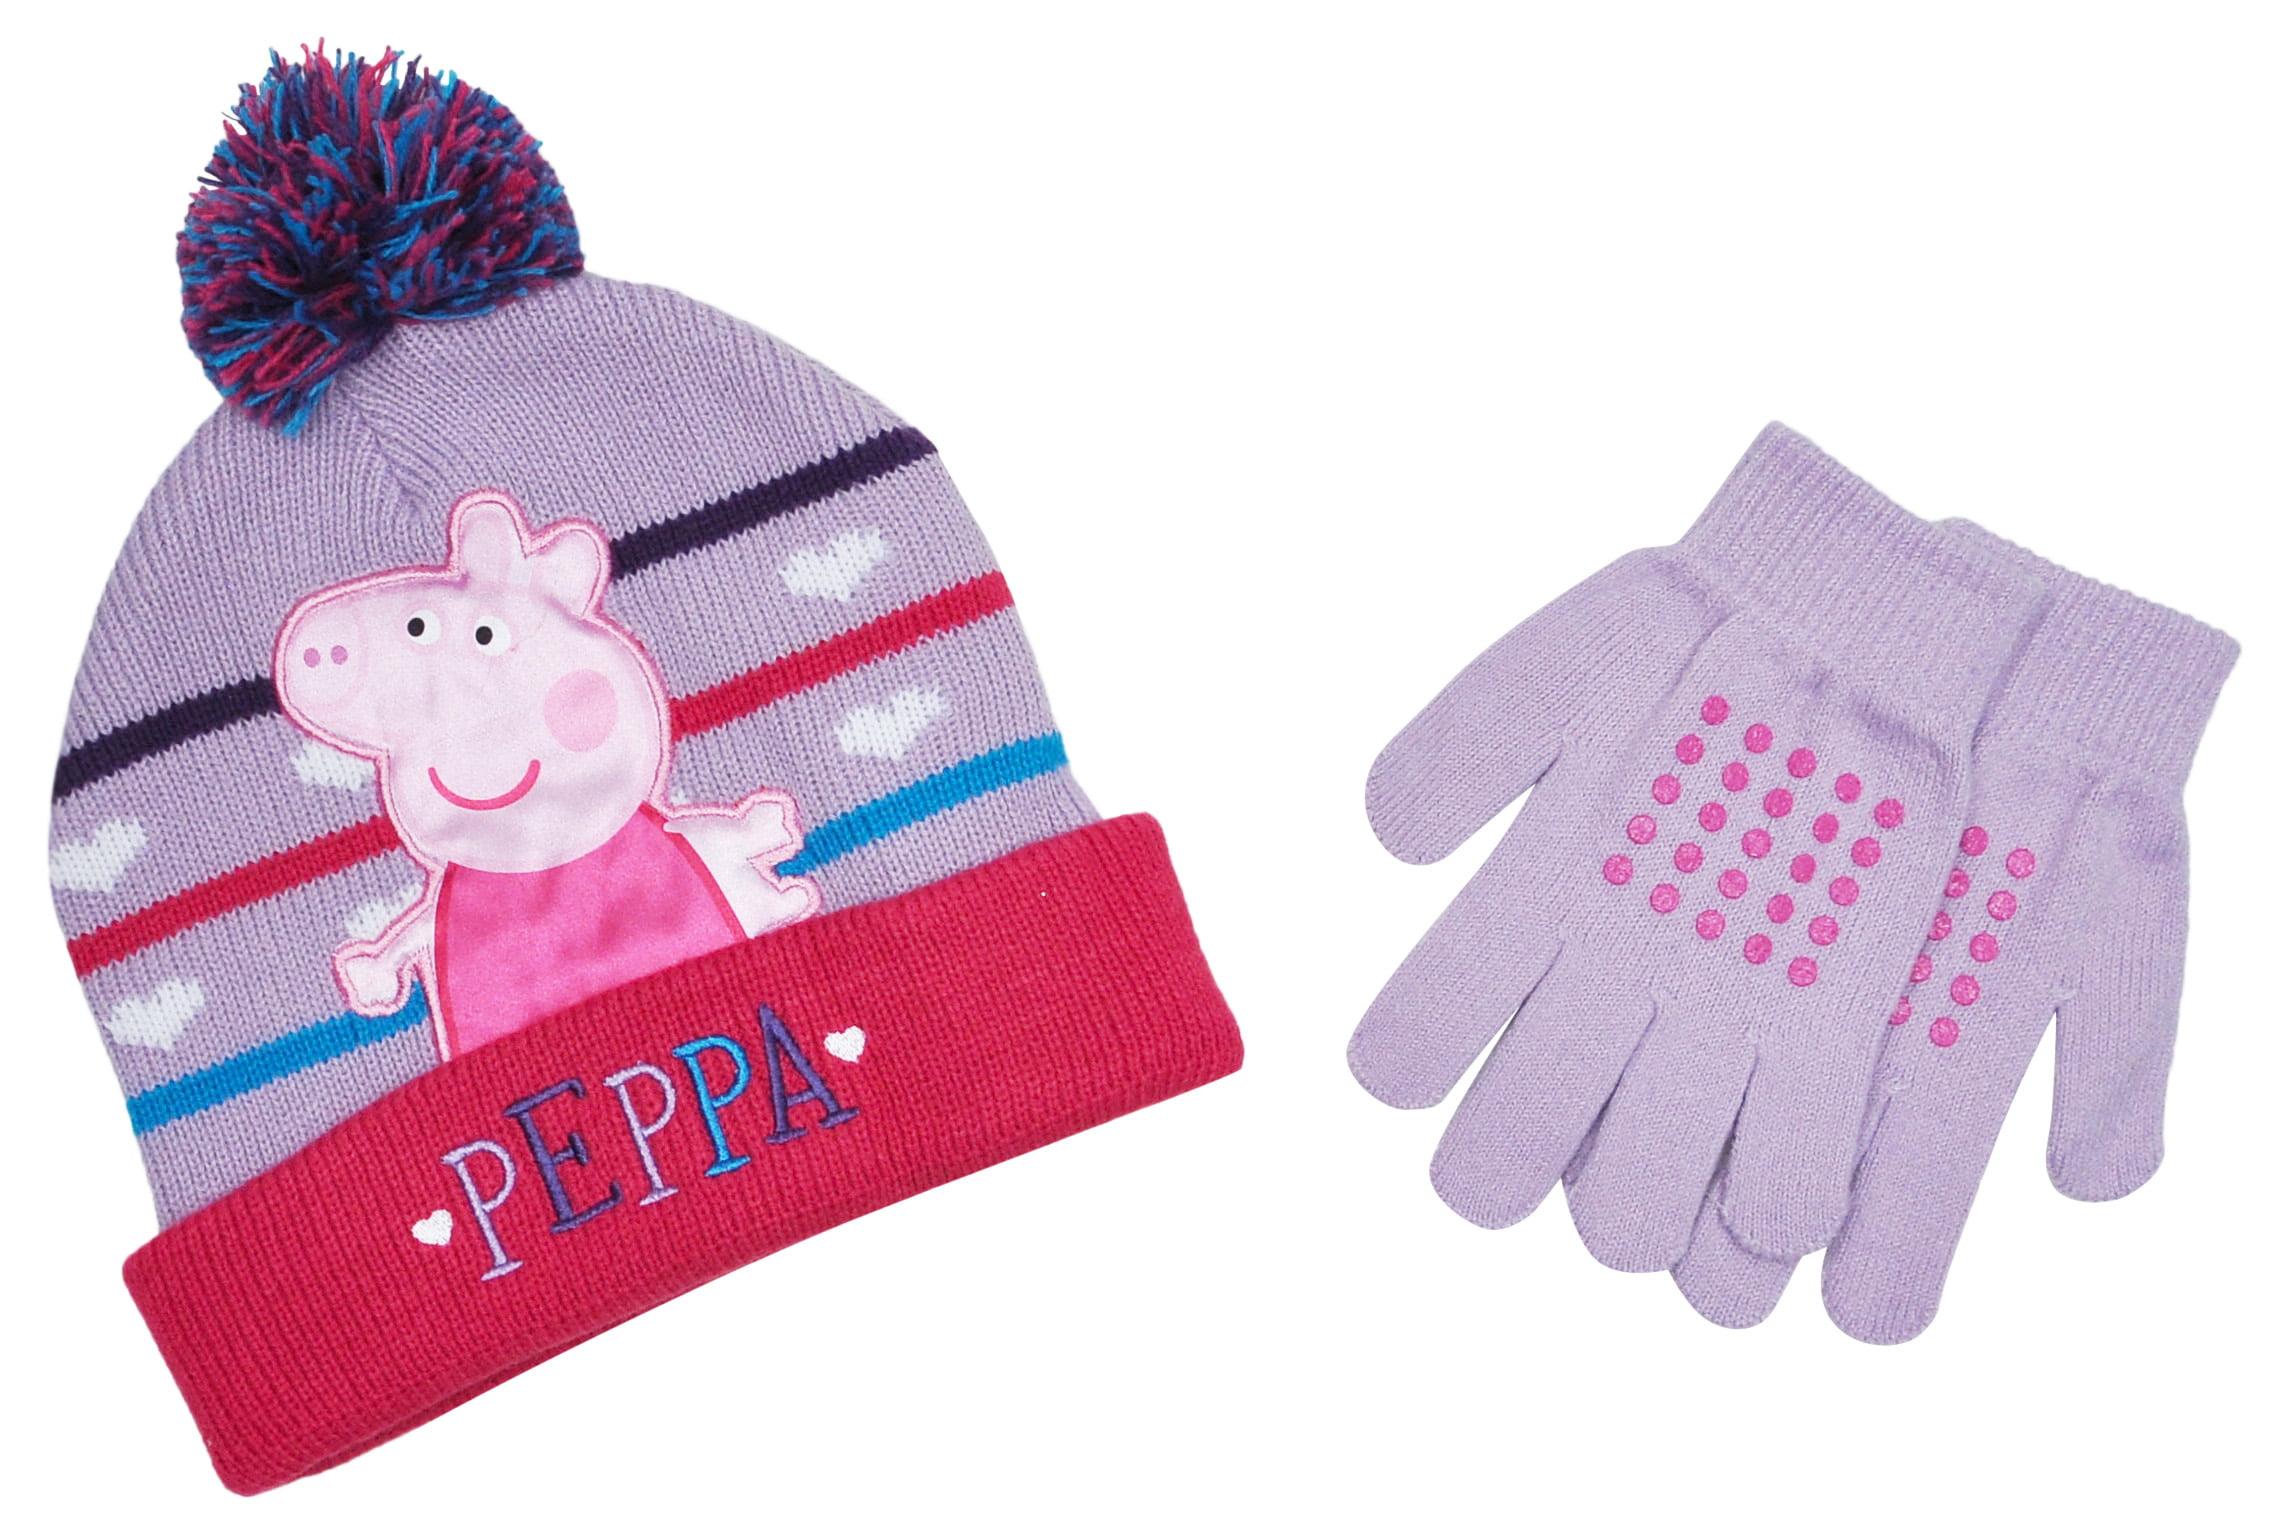 0d5d06120403c Peppa Pig - Peppa Girls Winter Beanie Hat   Gloves 2-Piece Set ...